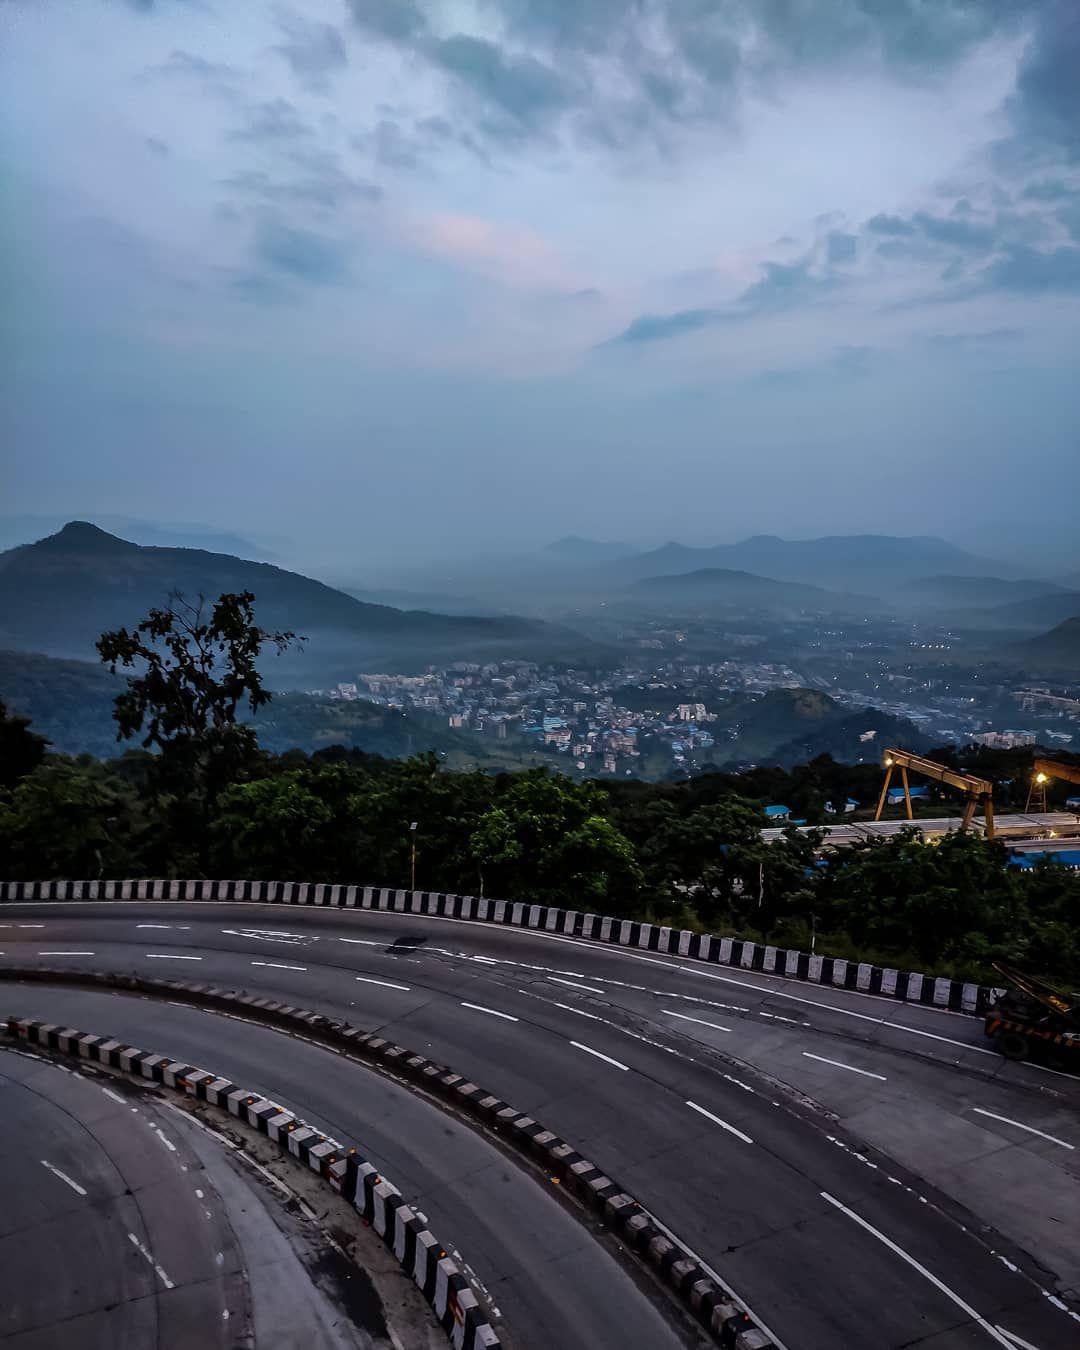 Happy sunday with a amazing weather 😇 .. .. .. .. .. .. .. ➖➖➖➖➖➖➖➖➖➖➖➖➖➖➖➖ Shot on:-@redmiindia #shotbymi #shotonxiaomi @xiaomiindia ➖➖➖➖➖➖➖➖➖➖➖➖➖➖➖➖ #dreamlandarmy #mr_dreamcatcher #travelwithharshal #travelrealindia #instagood #travel #travelphotography #life #mountains #streetphotography #photooftheday #beautiful #incredibleindia #beautifuldestinations #foggy #clouds #huntforspot #tripotocommunity